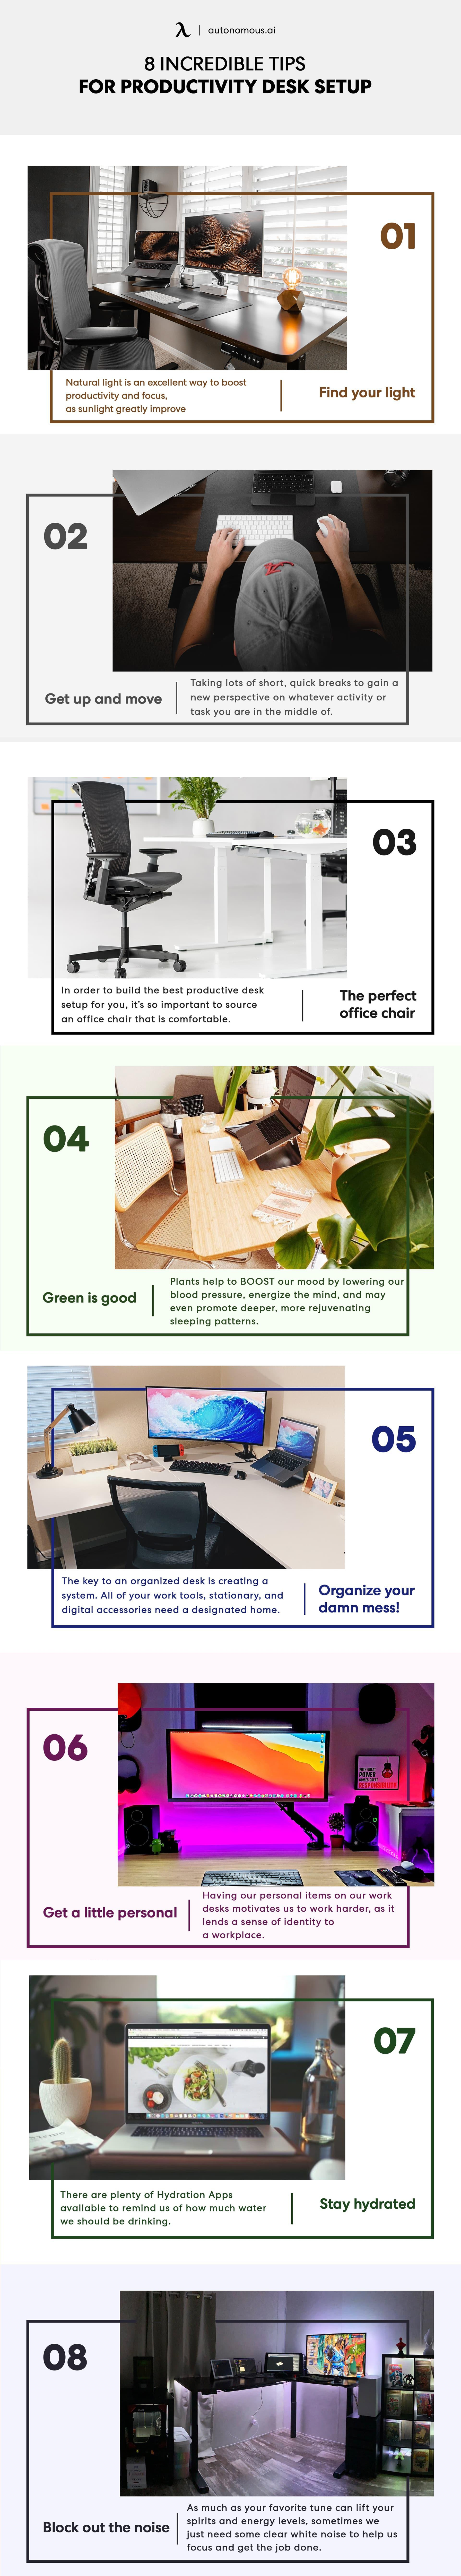 Desk setup for productivity